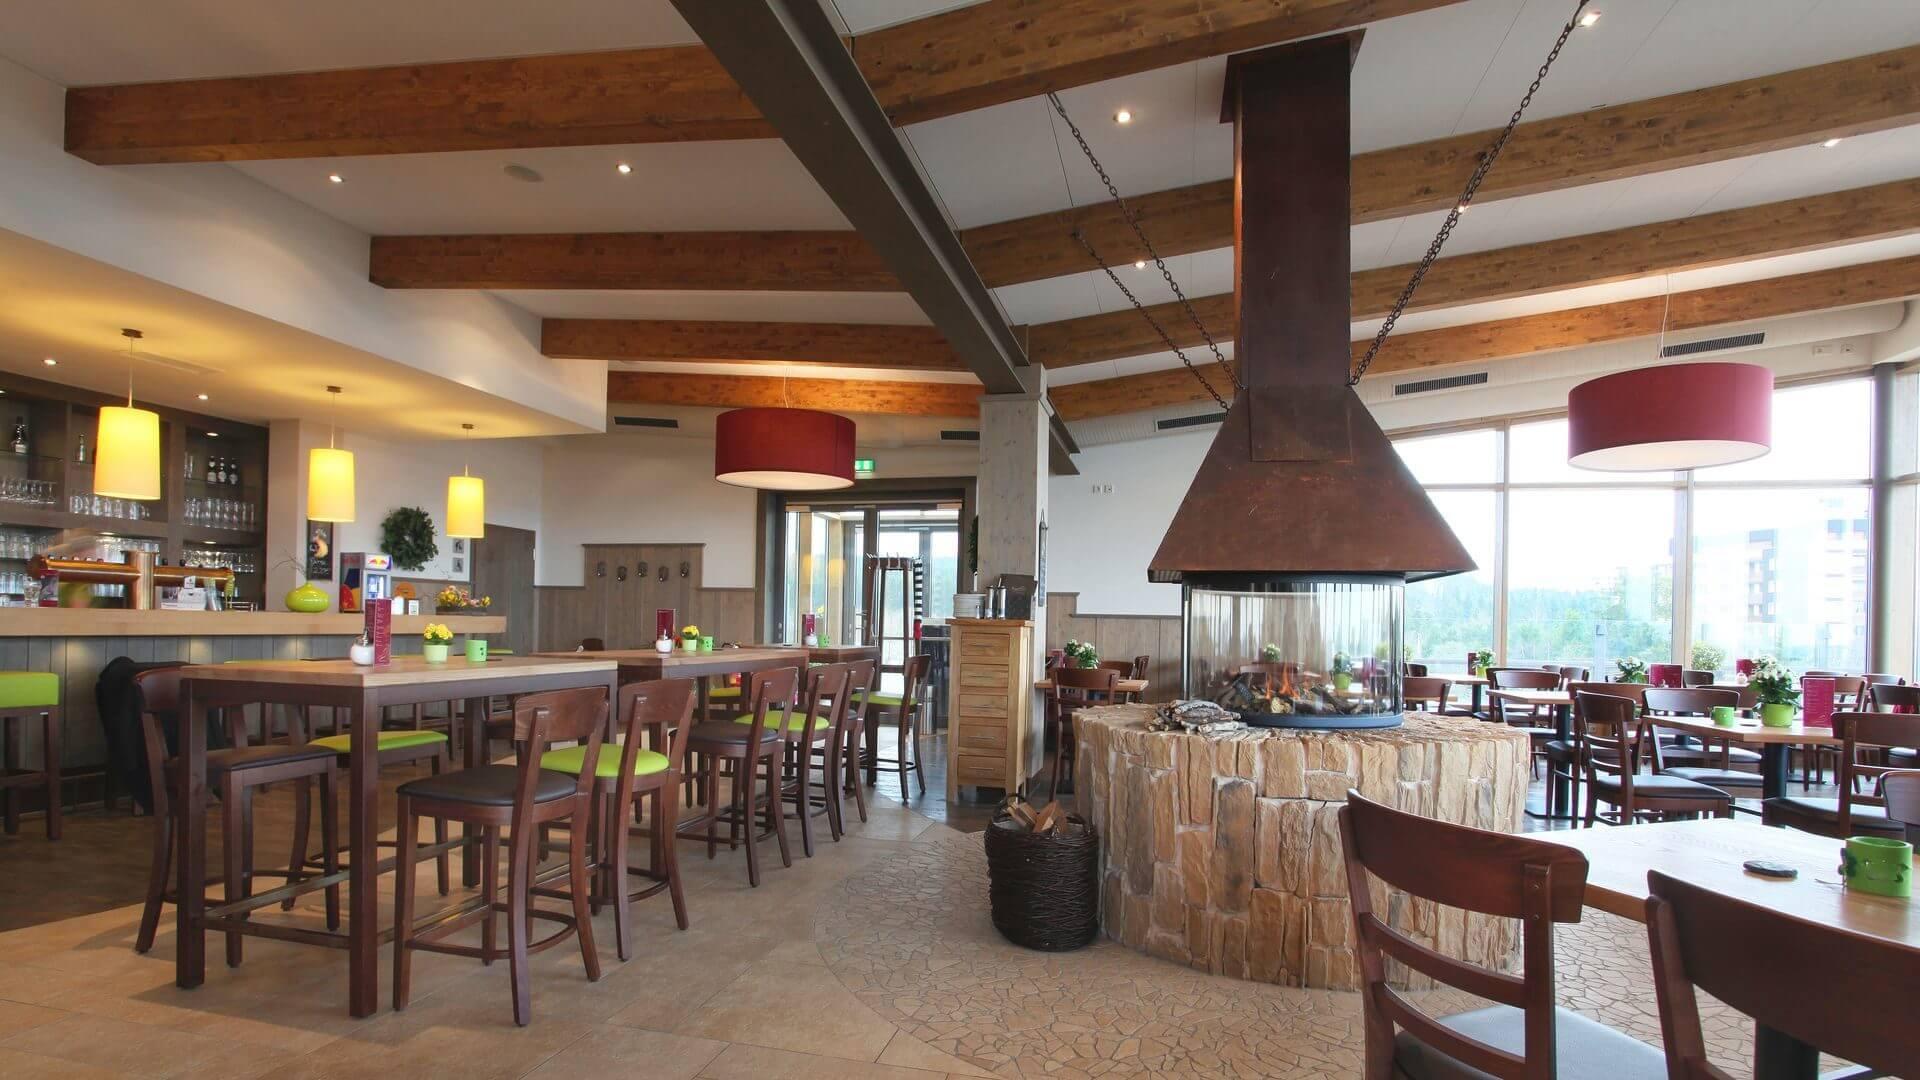 Bar und Kamin im Panorama Café-Restaurant Winterberg